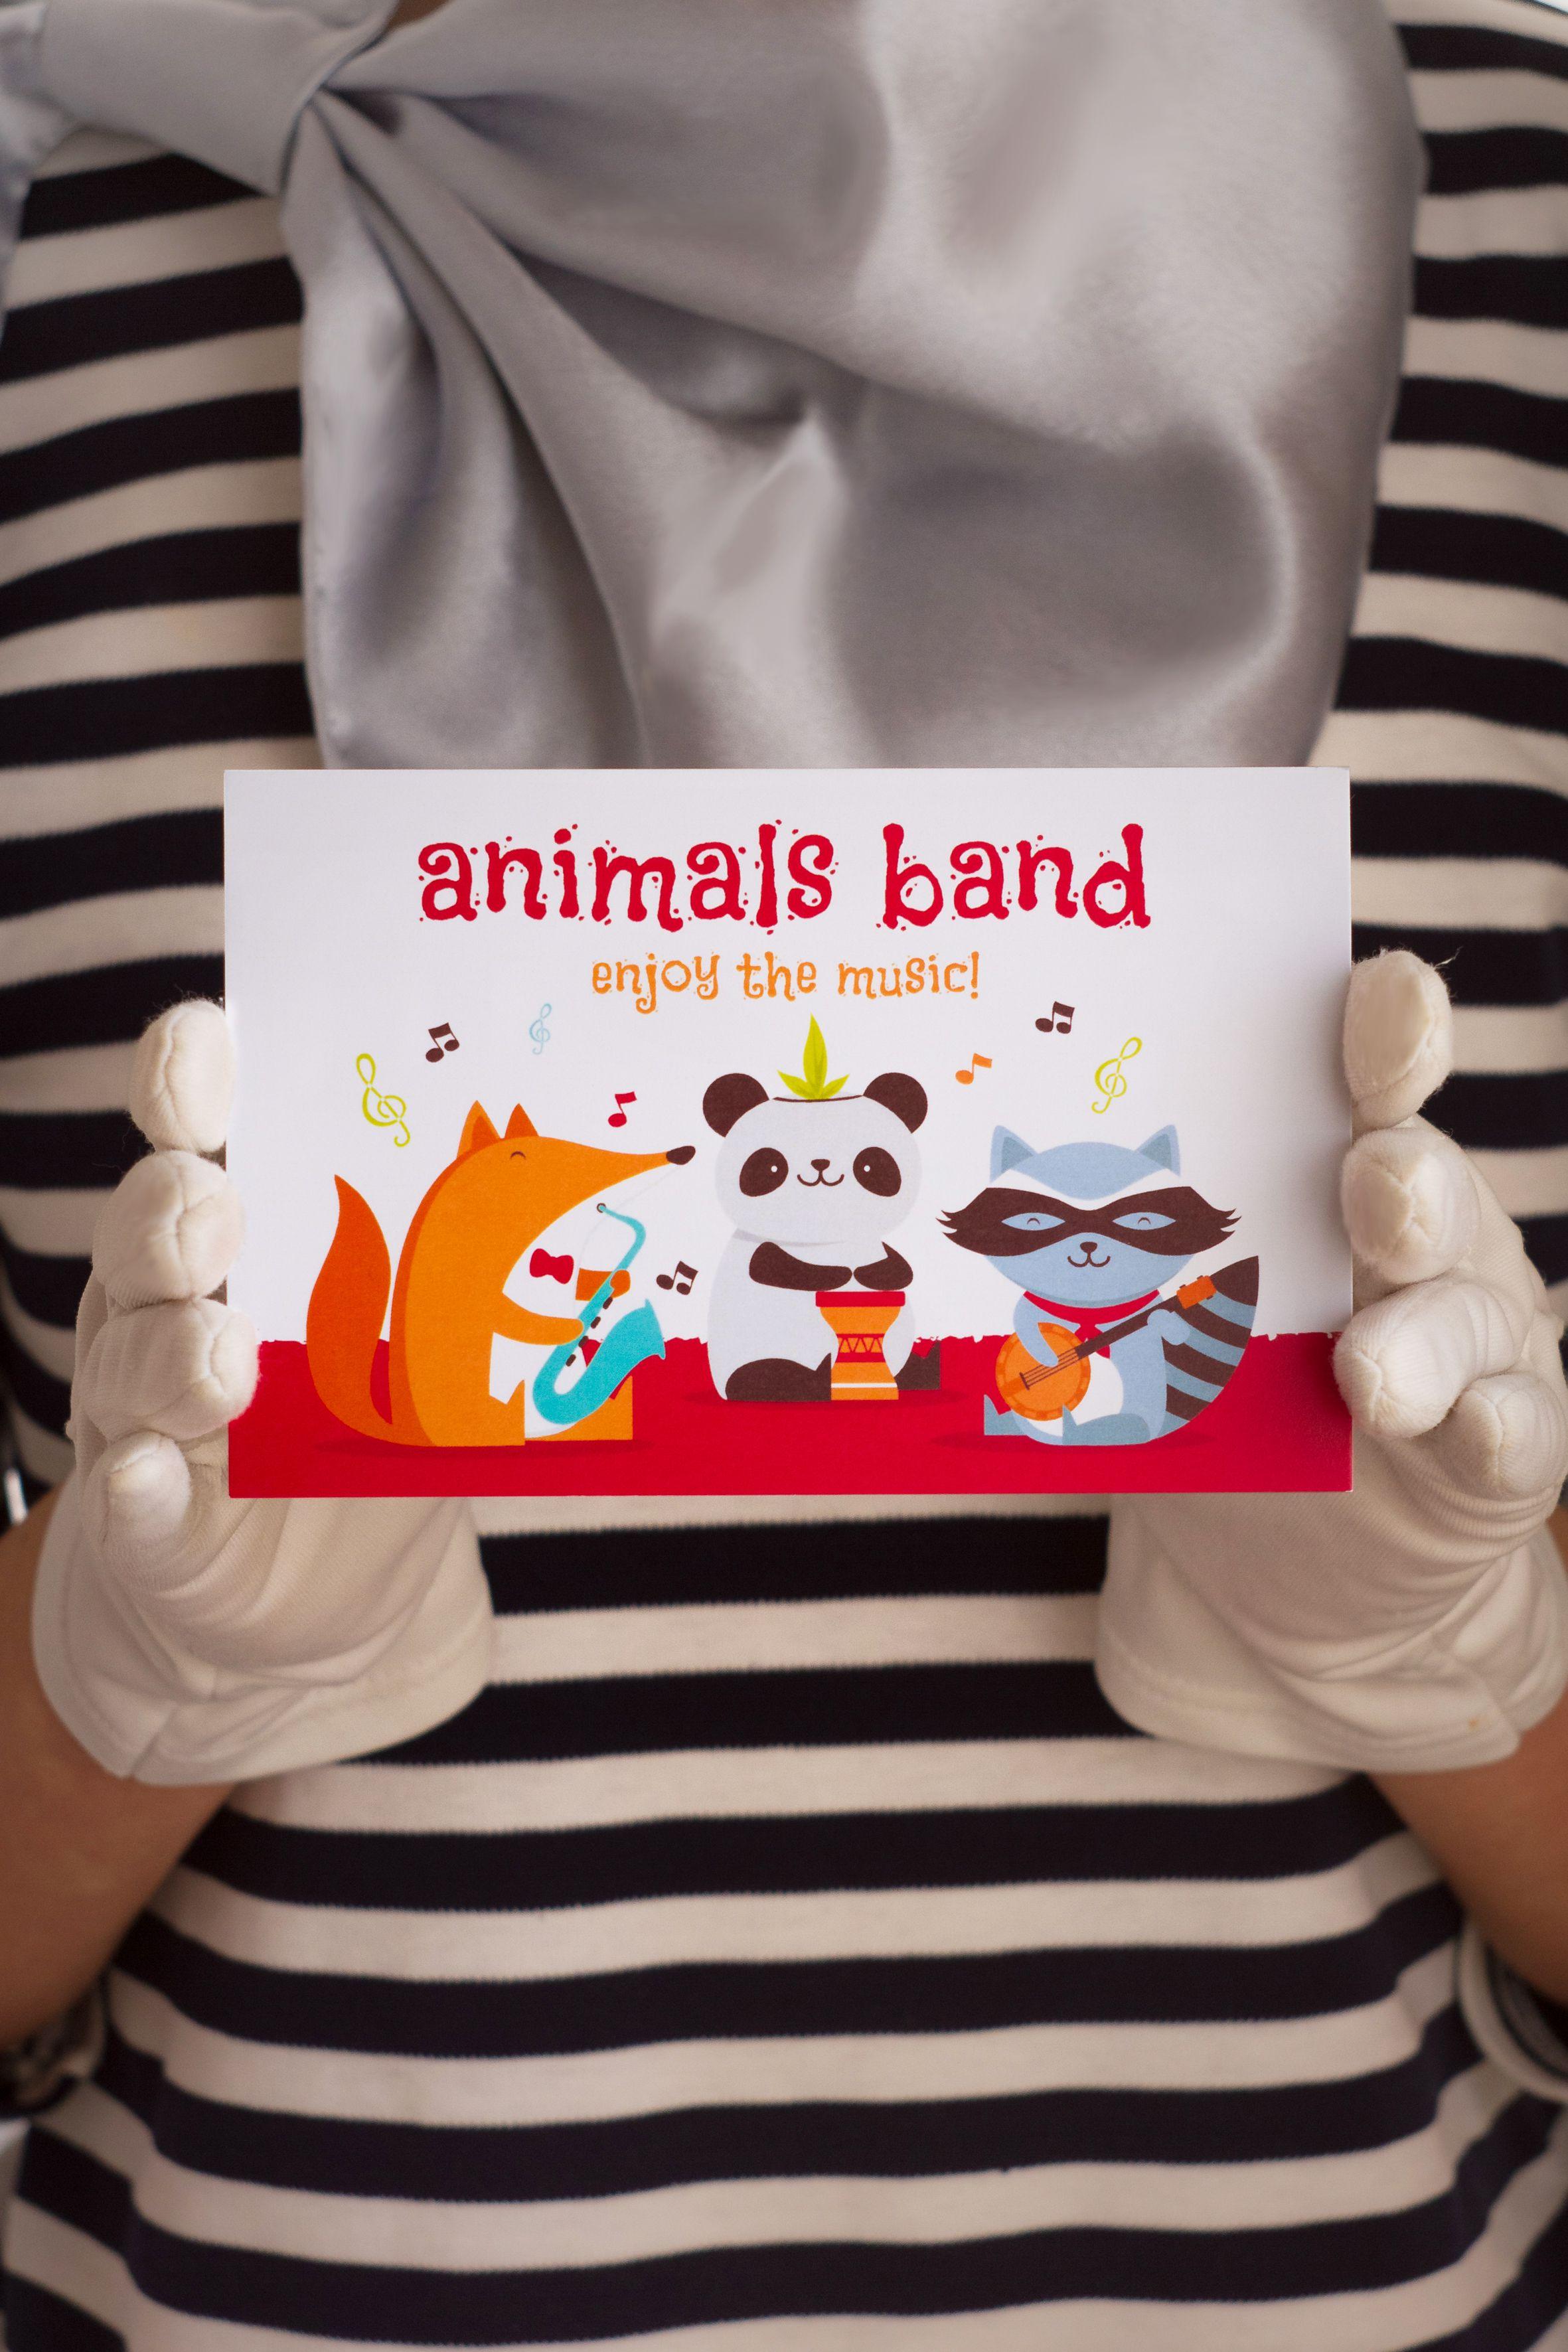 знаквнимания animalsband gift банда card сюрприз remembrance surprise открытка животные подарок